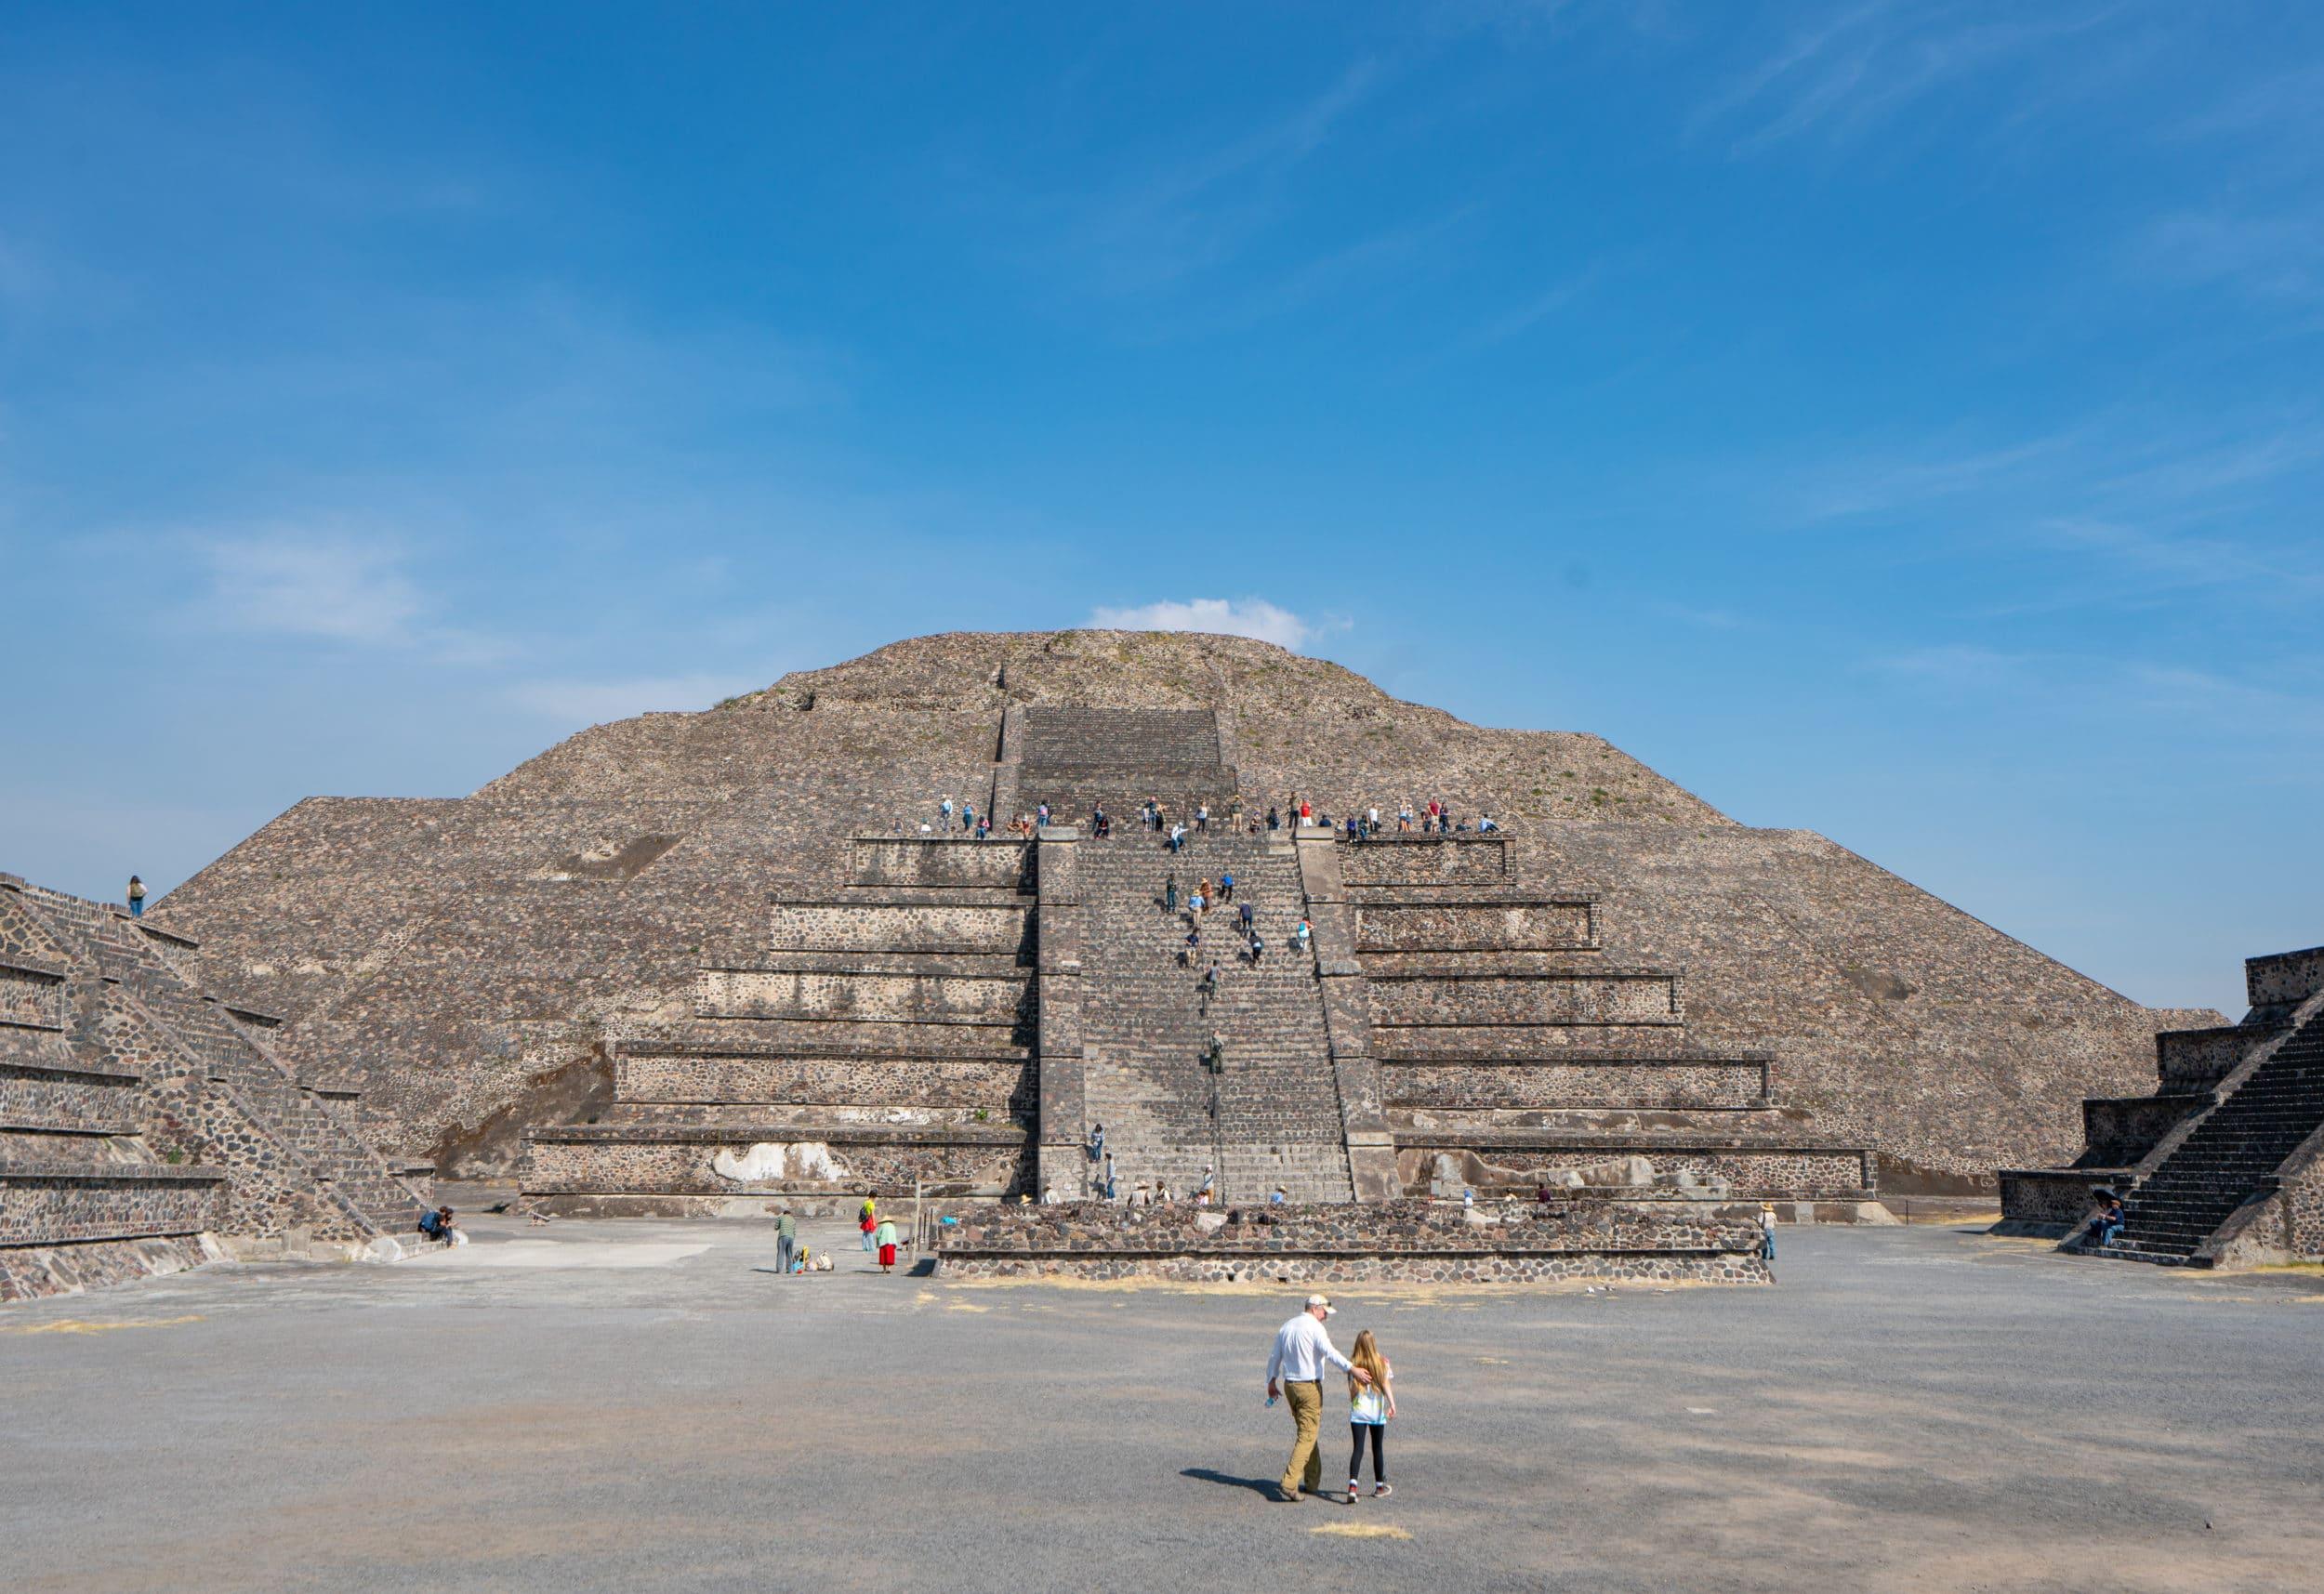 My daughter and husband walk toward a pyramid at Teotihuacan on a sunny day.